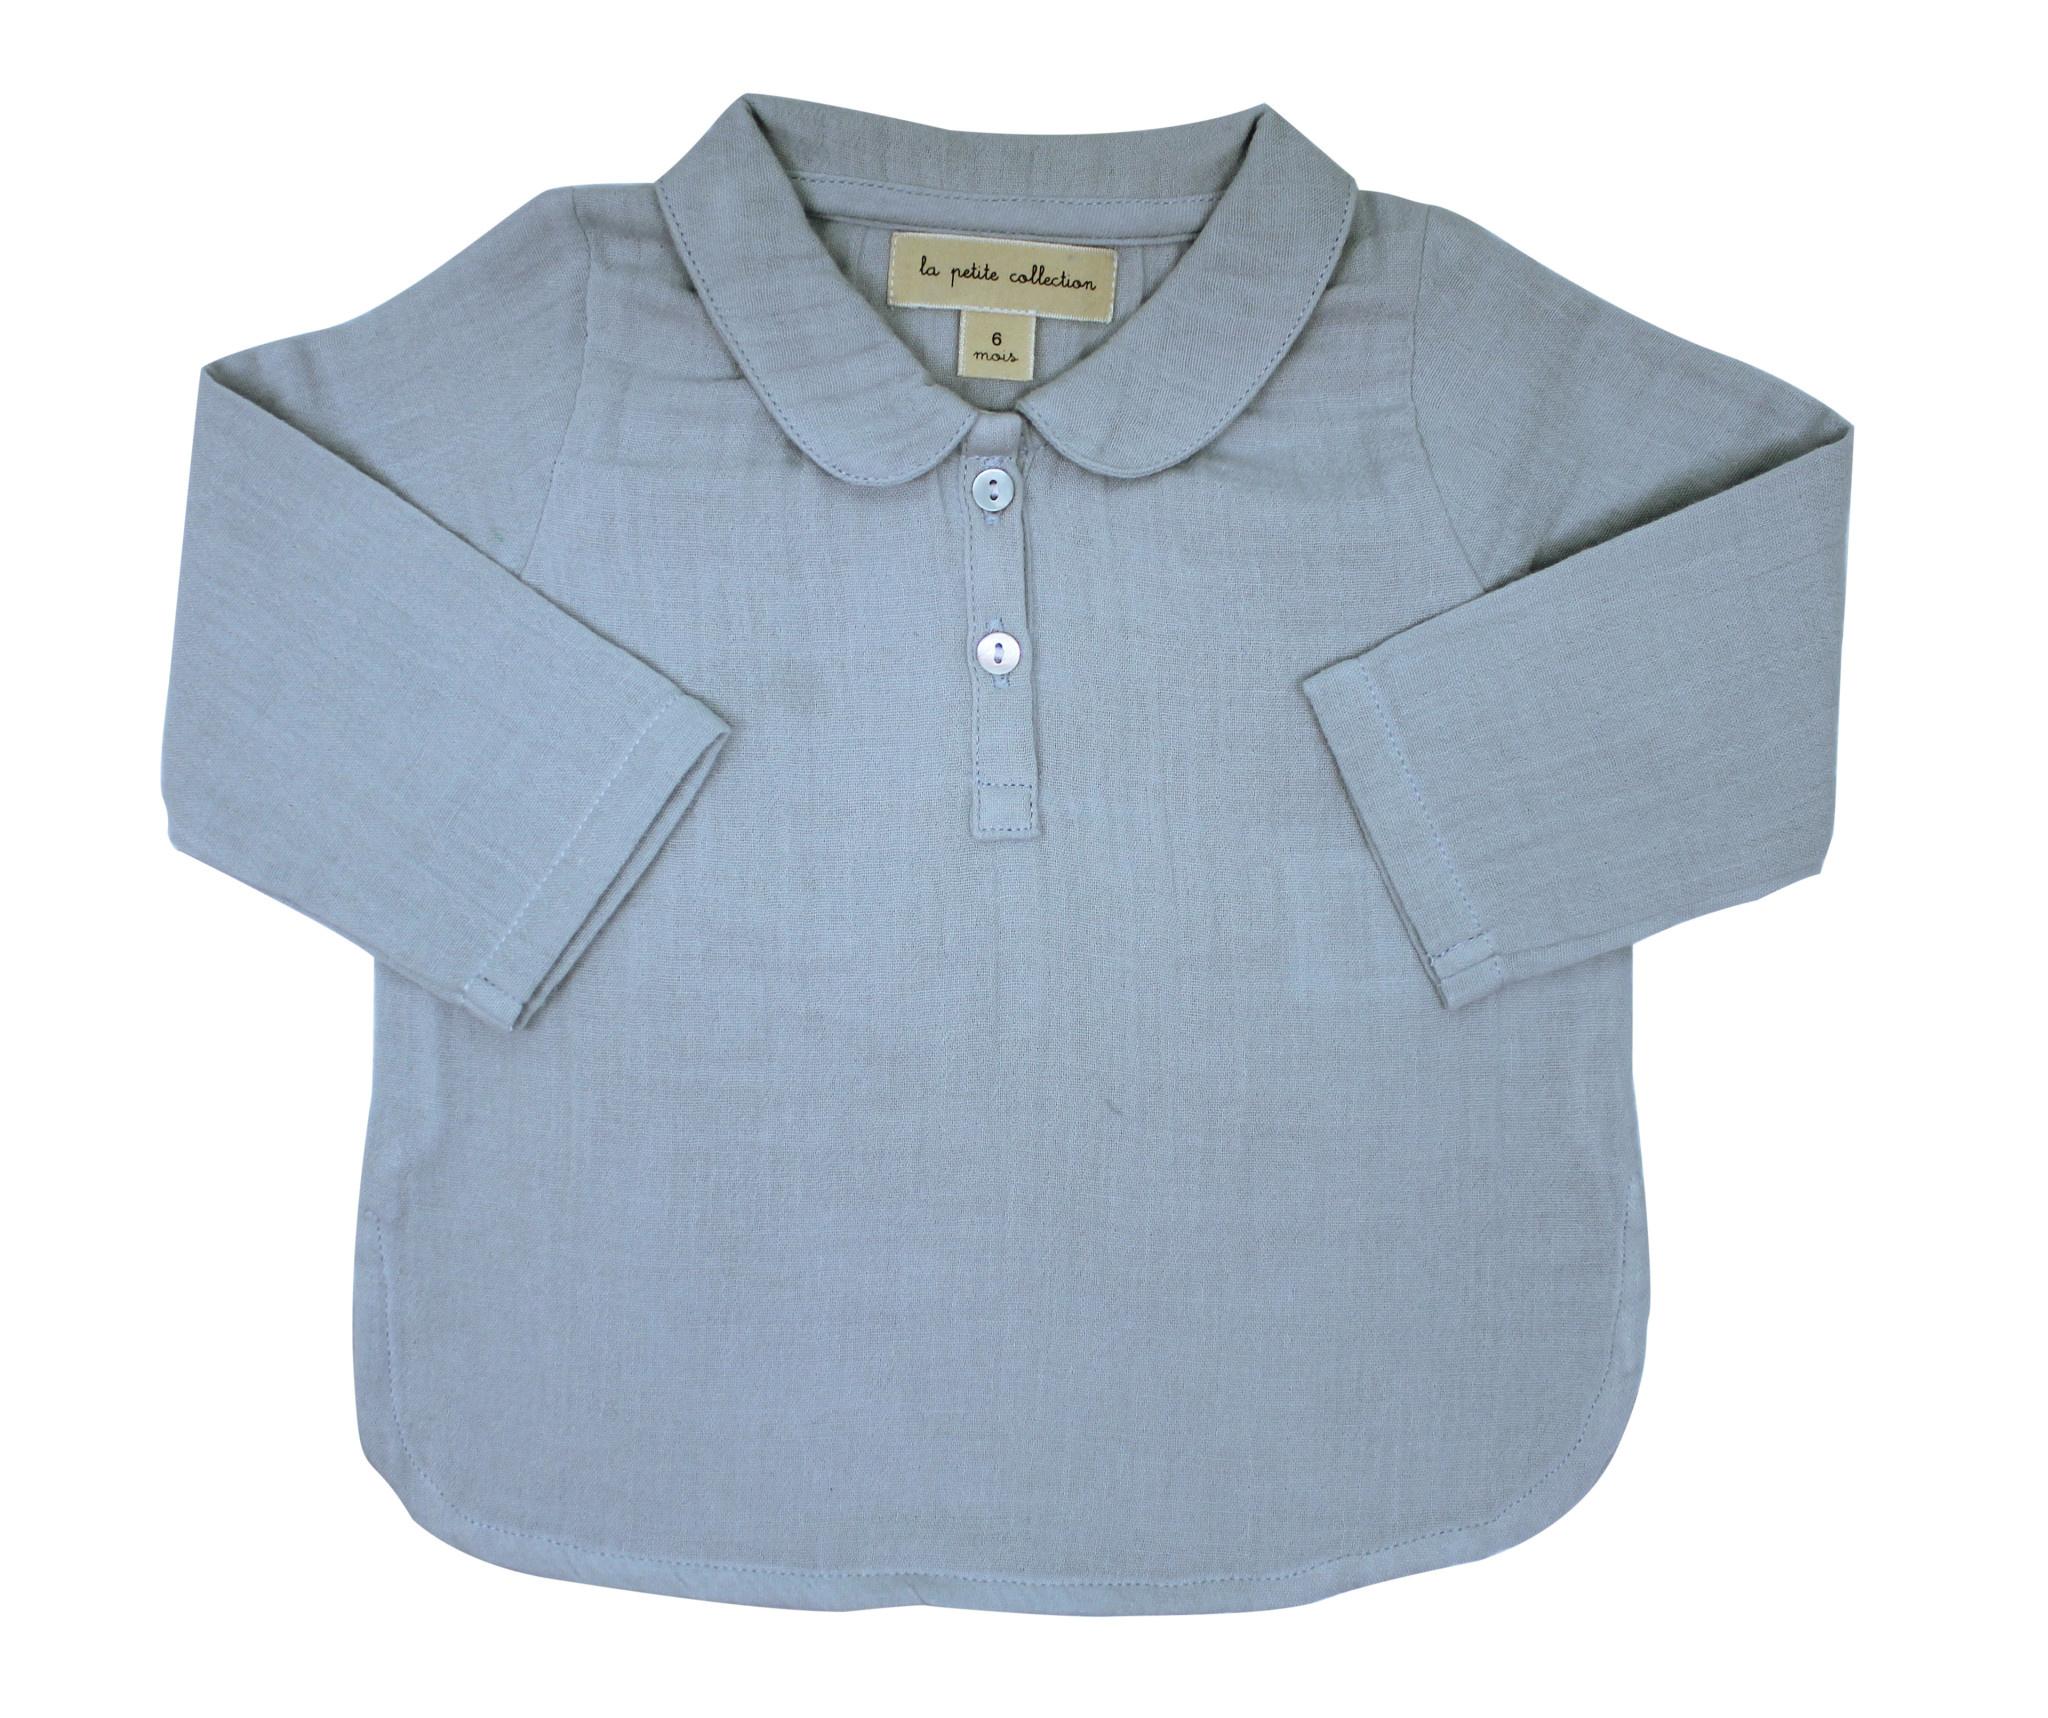 la petite collection Claudine Shirt Sky Gauze